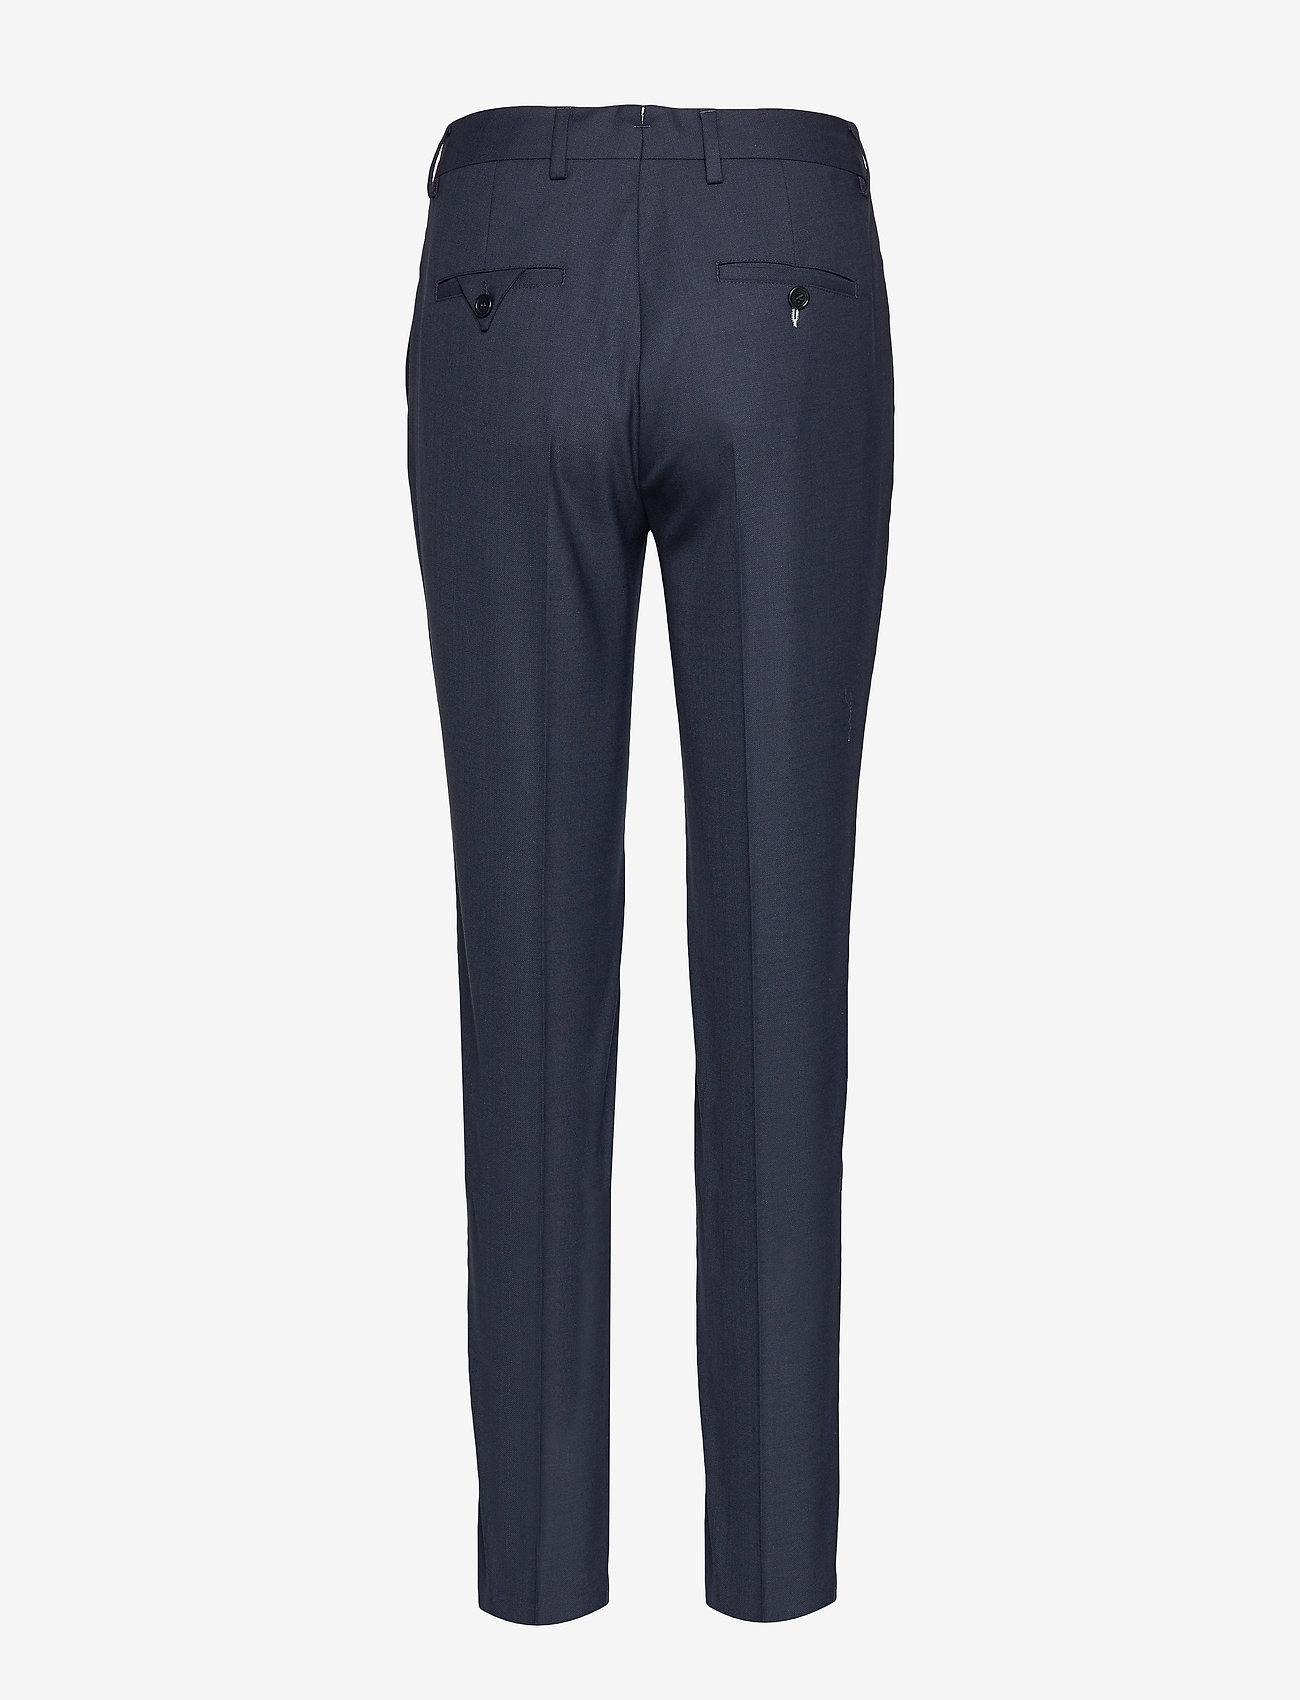 Gant - CLUB PANTS - suorat housut - marine